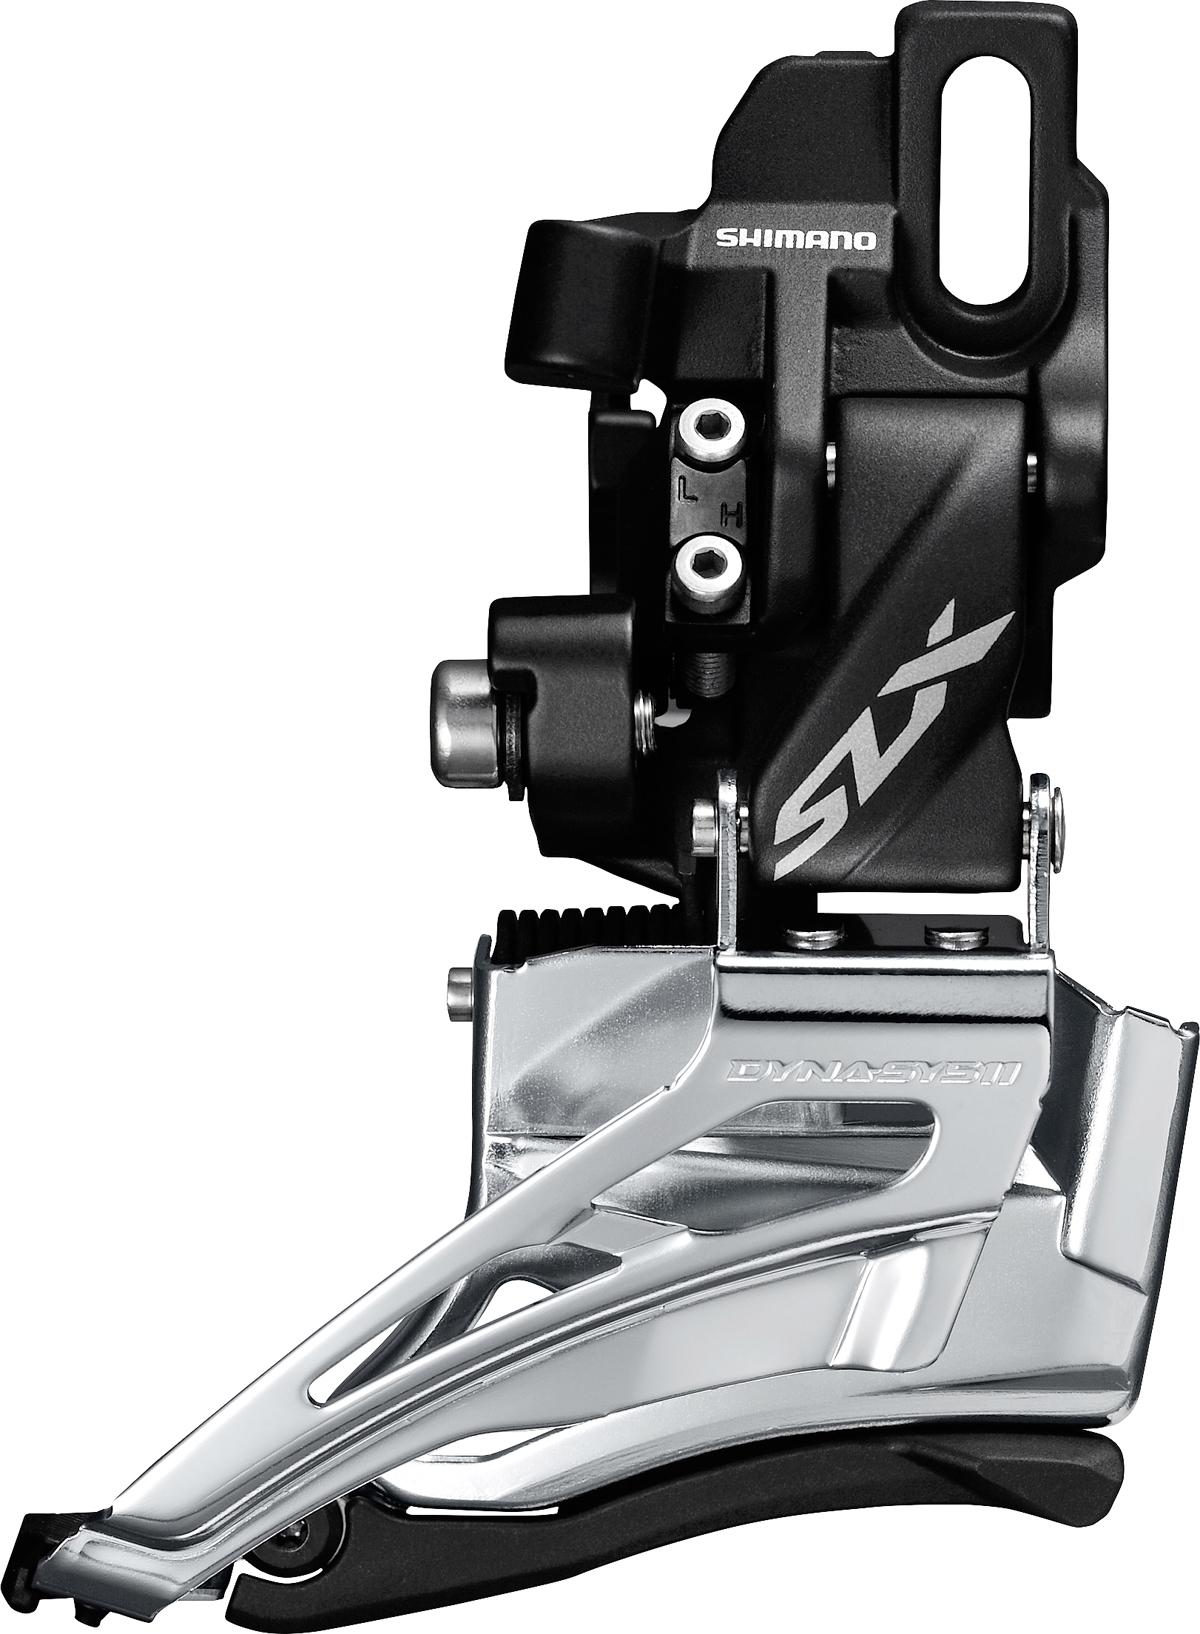 Shimano přesmykač SLX FD-M7025 MTB pro 2x11 př mont D-typ Down-swing dual pull 34/38 z